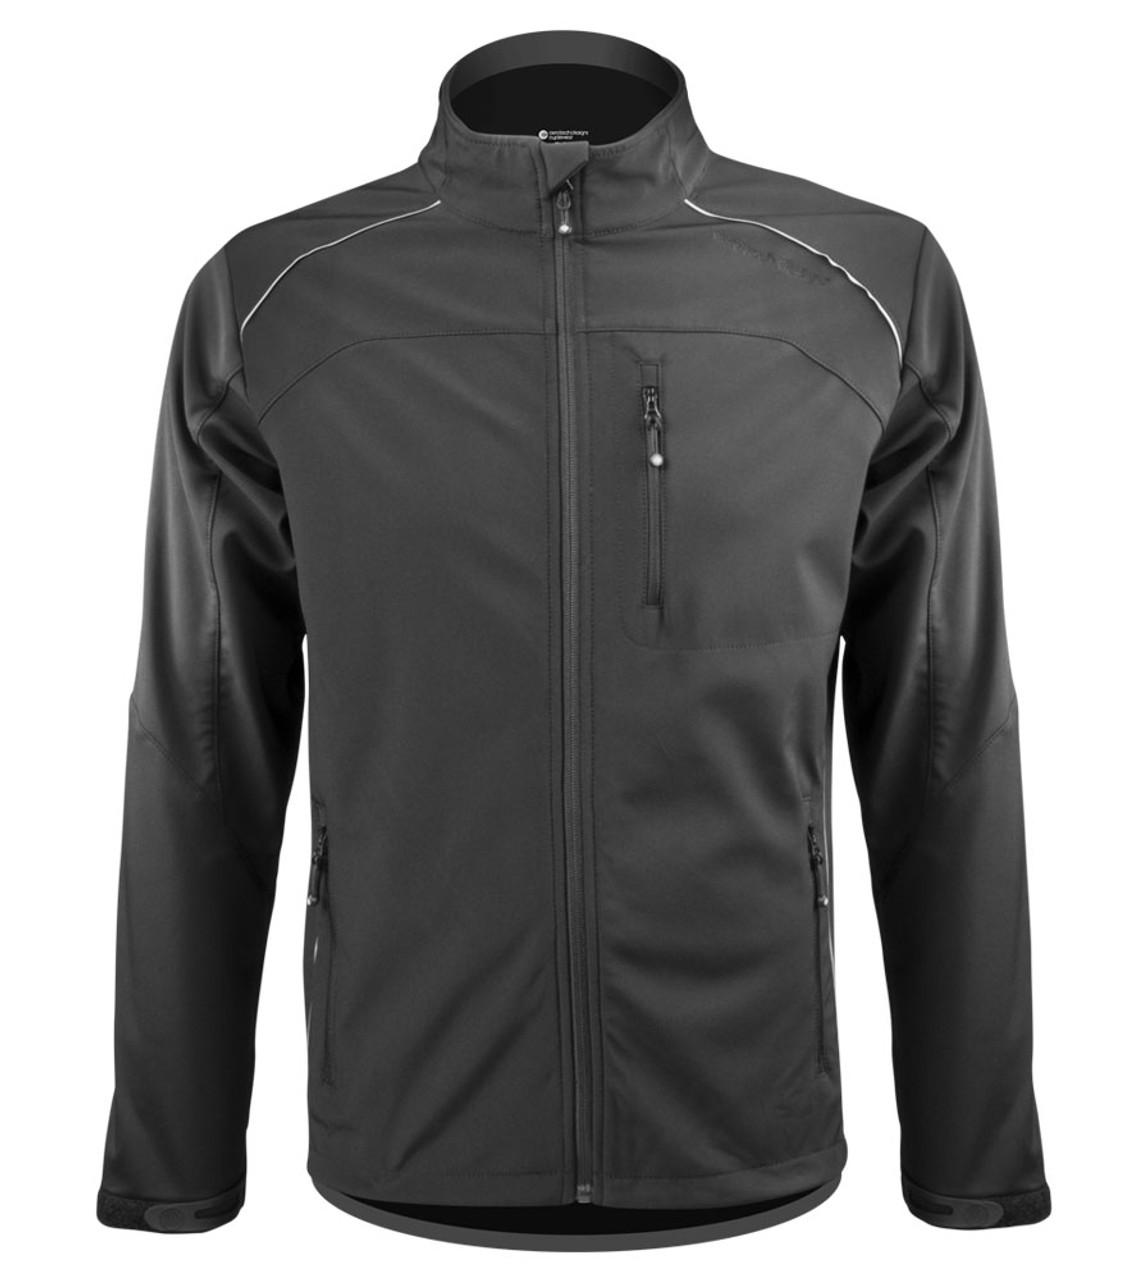 b4b3d57e655 Aero Tech Men's Multi-Sport Softshell Jacket - Windproof Breathable  Reflective